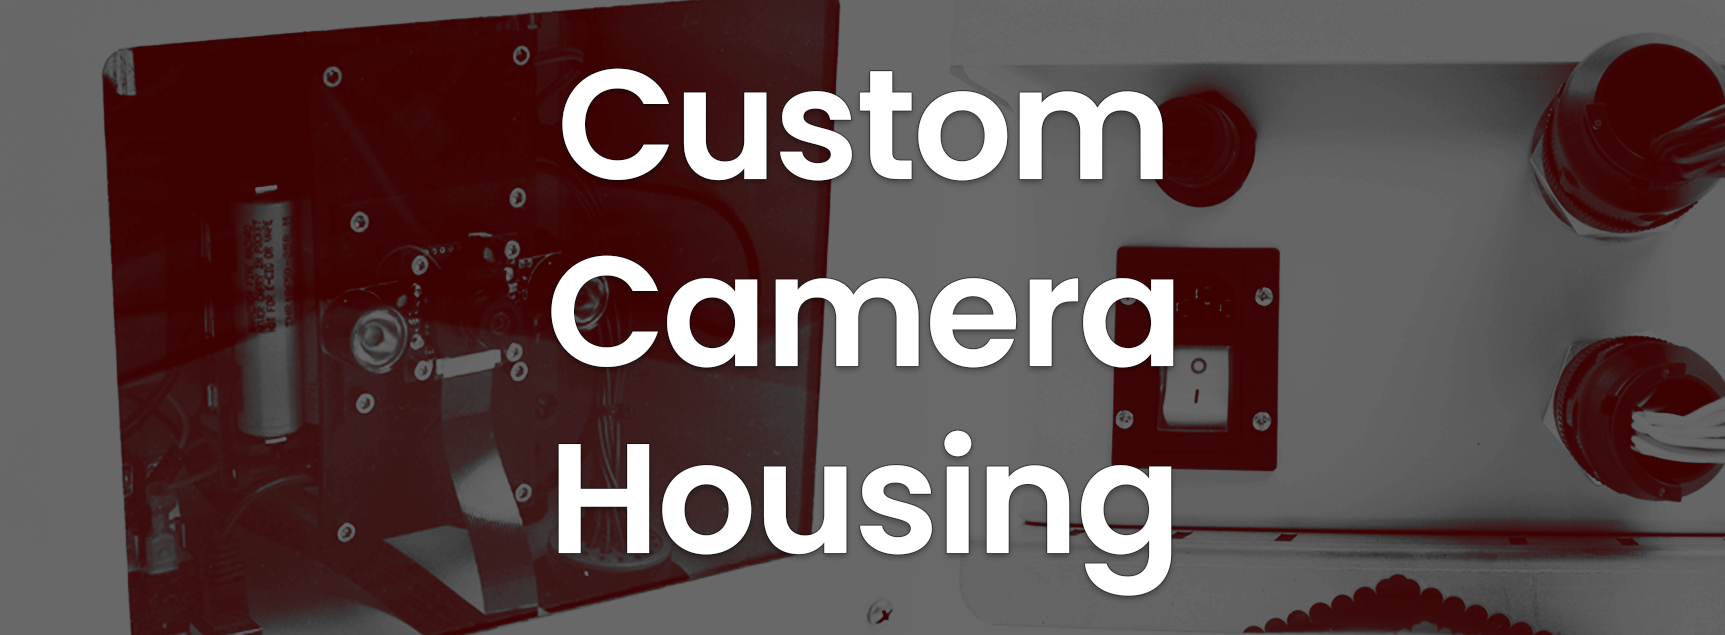 Custom Camera Housing Banner